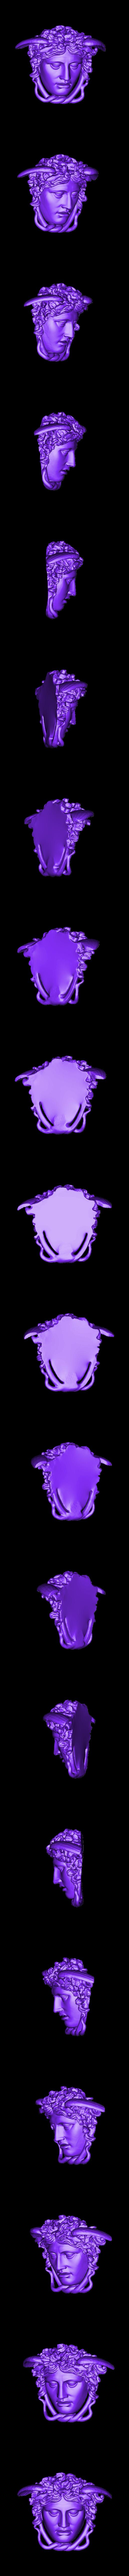 20141017_1_MedusaRondanini_SmthPt1x100_by_CosmoWenman.obj Download free OBJ file The Medusa Rondanini • 3D print template, Ghashgar